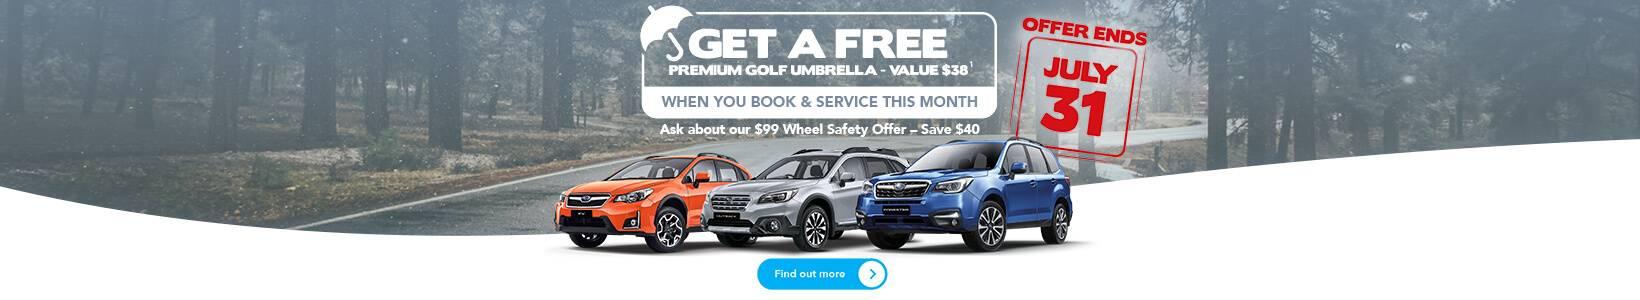 Trivett Subaru Service Offer